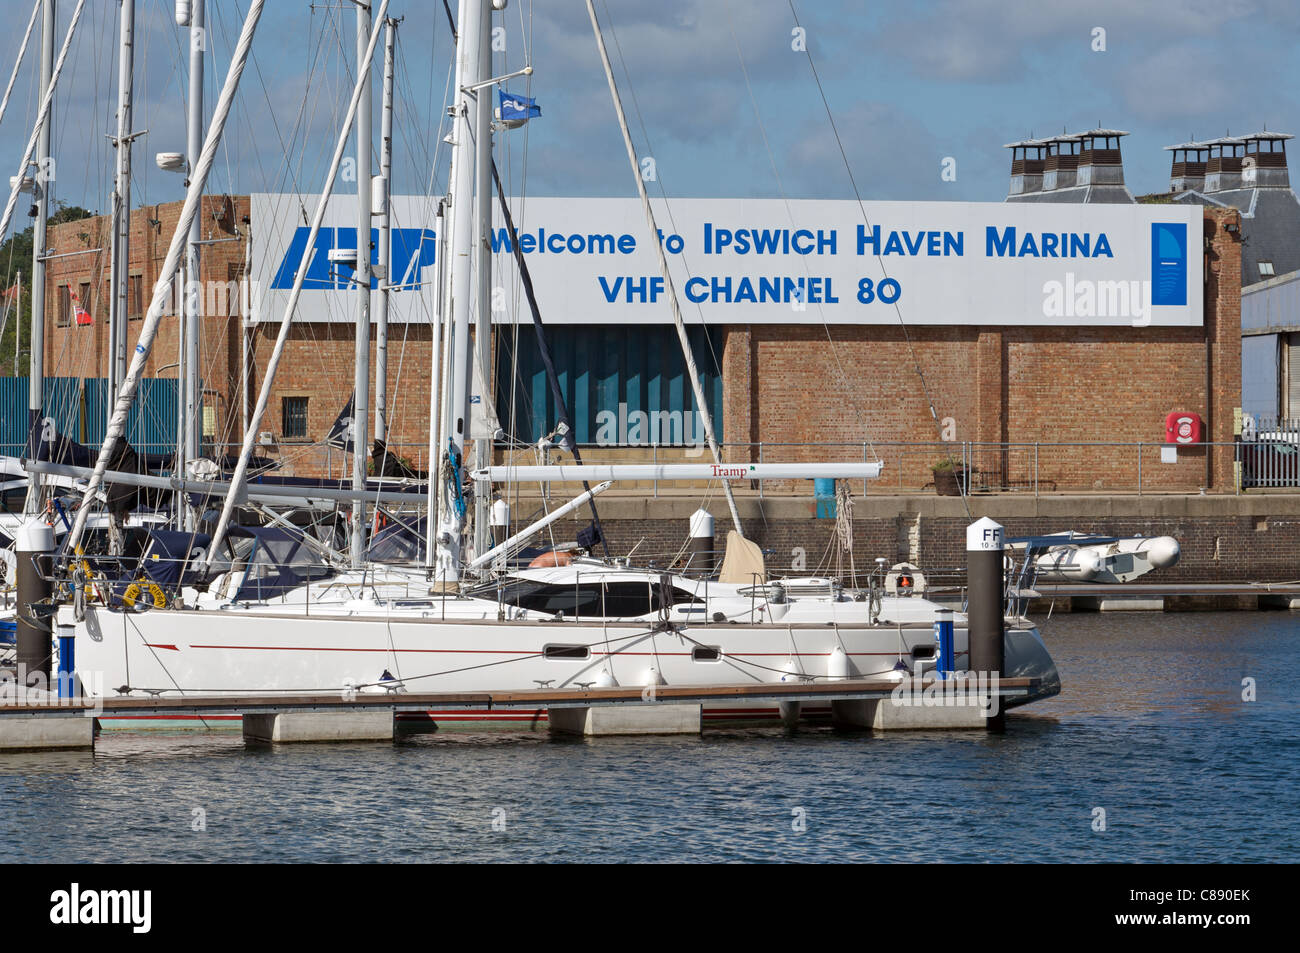 Ipswich Haven Marina, Suffolk, UK. - Stock Image